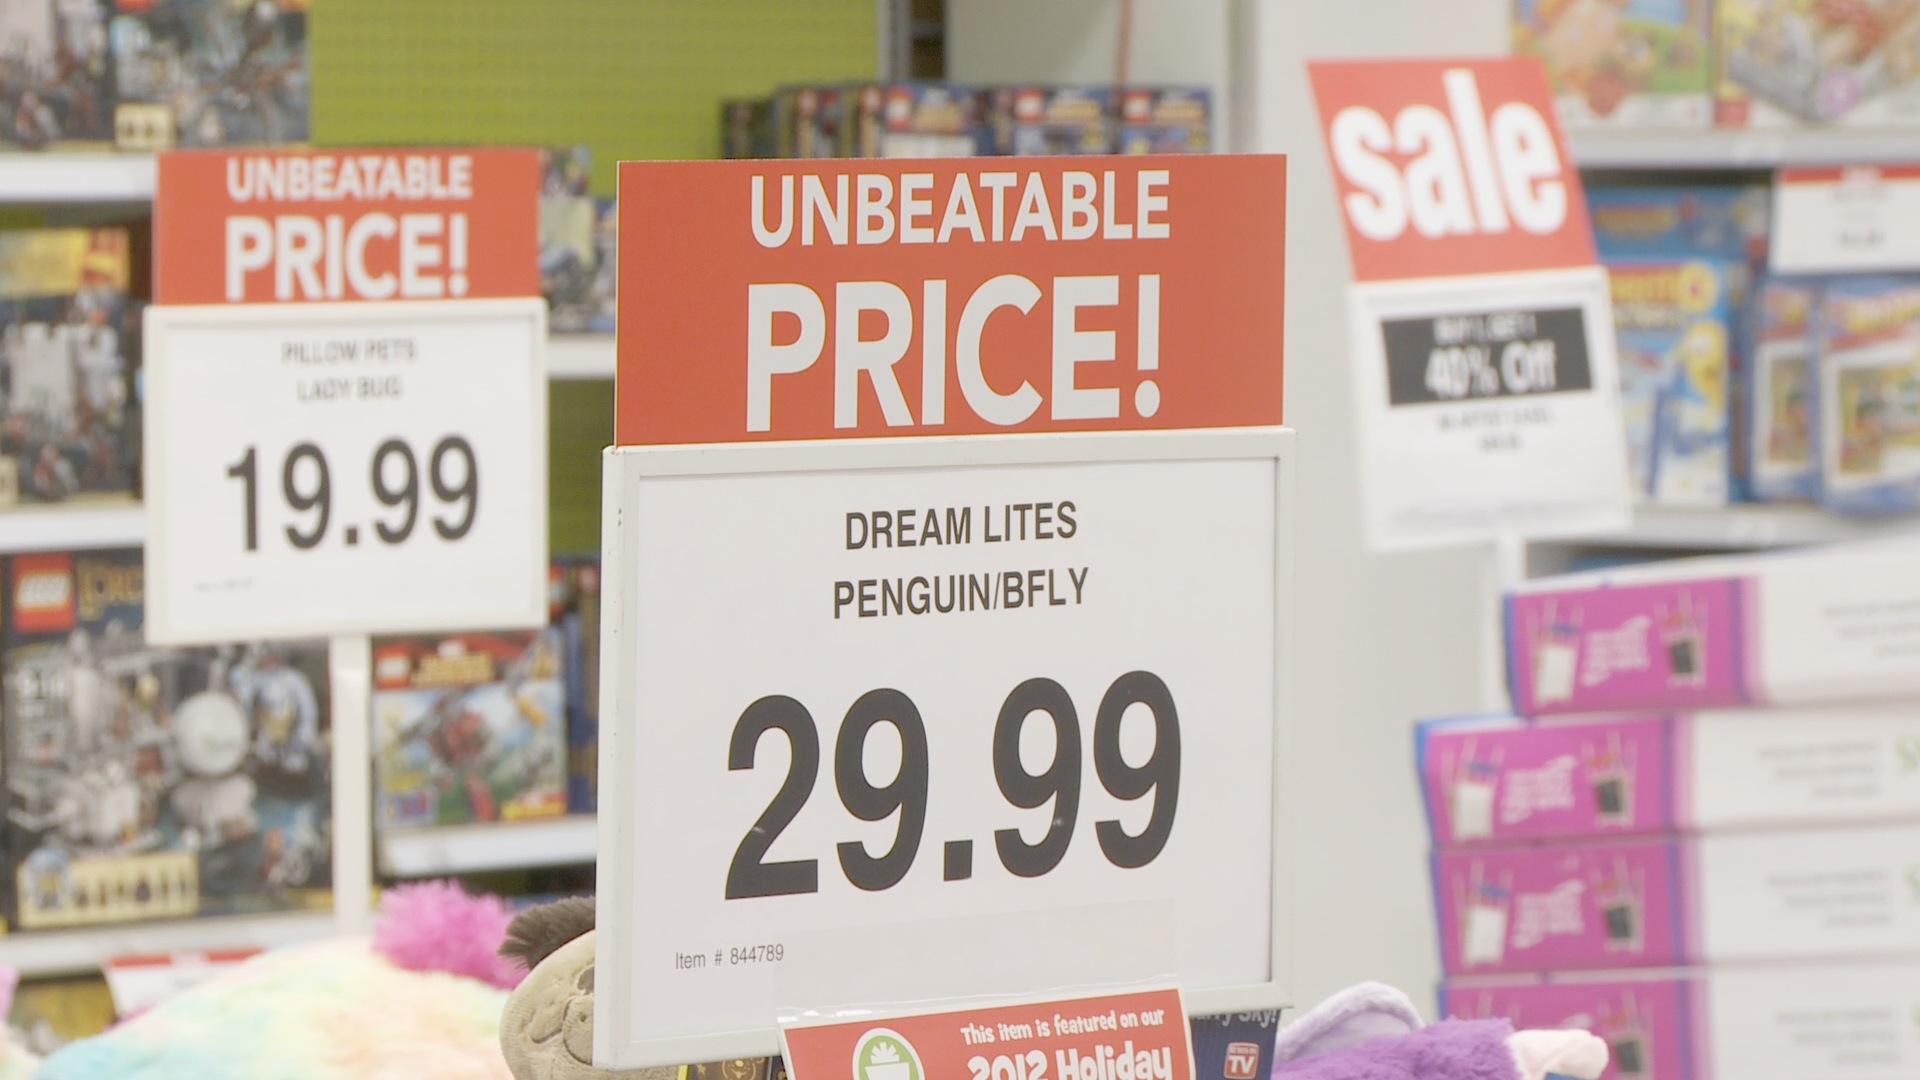 Psychology Behind Pricing